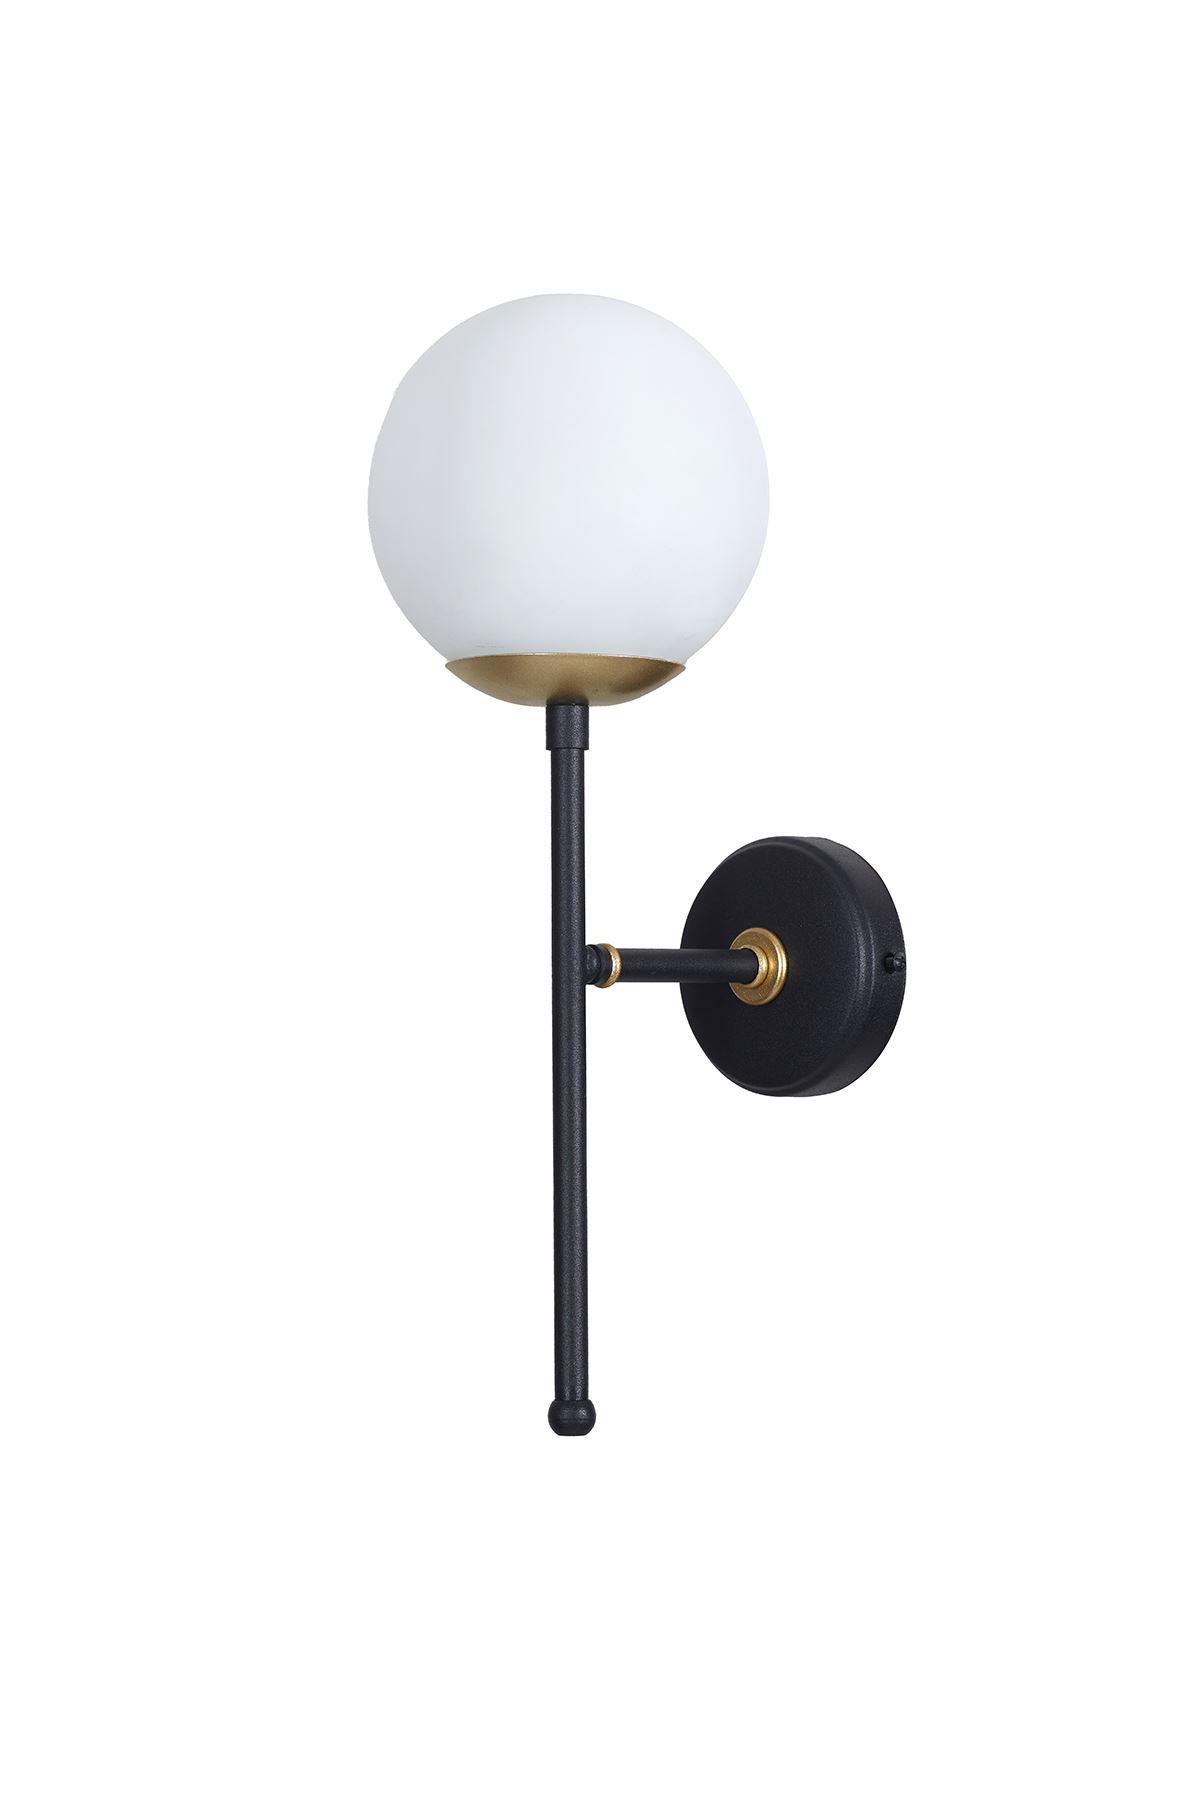 Olimpo Sarı-Siyah Metal Gövde Beyaz Camlı Tasarım Lüx Aplik